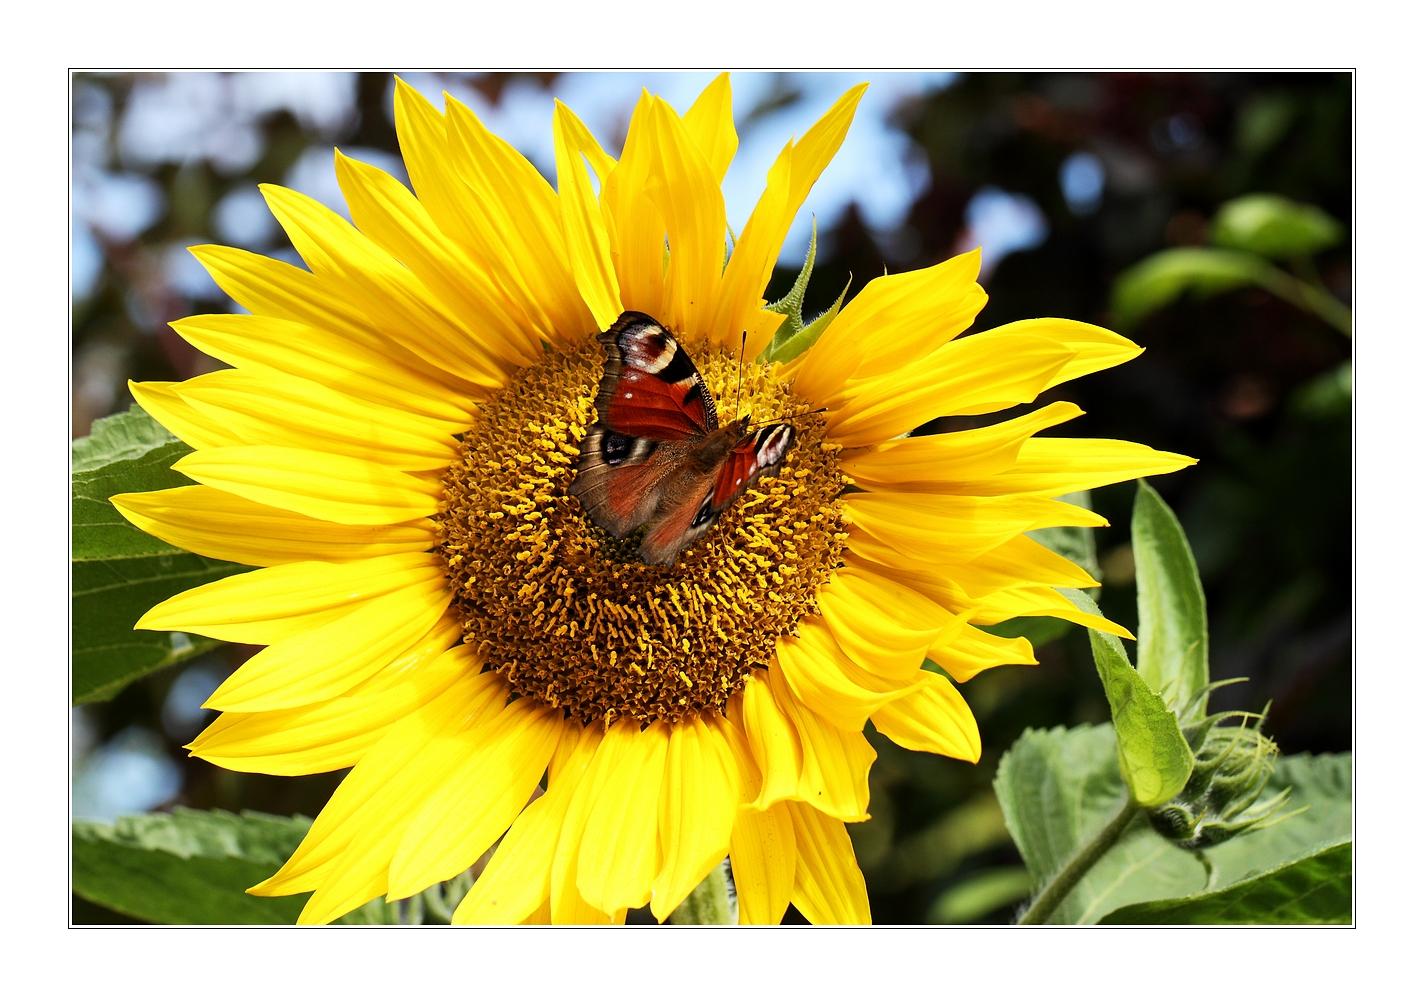 sonnenblume mit schmetterling foto bild pflanzen pilze flechten bl ten kleinpflanzen. Black Bedroom Furniture Sets. Home Design Ideas